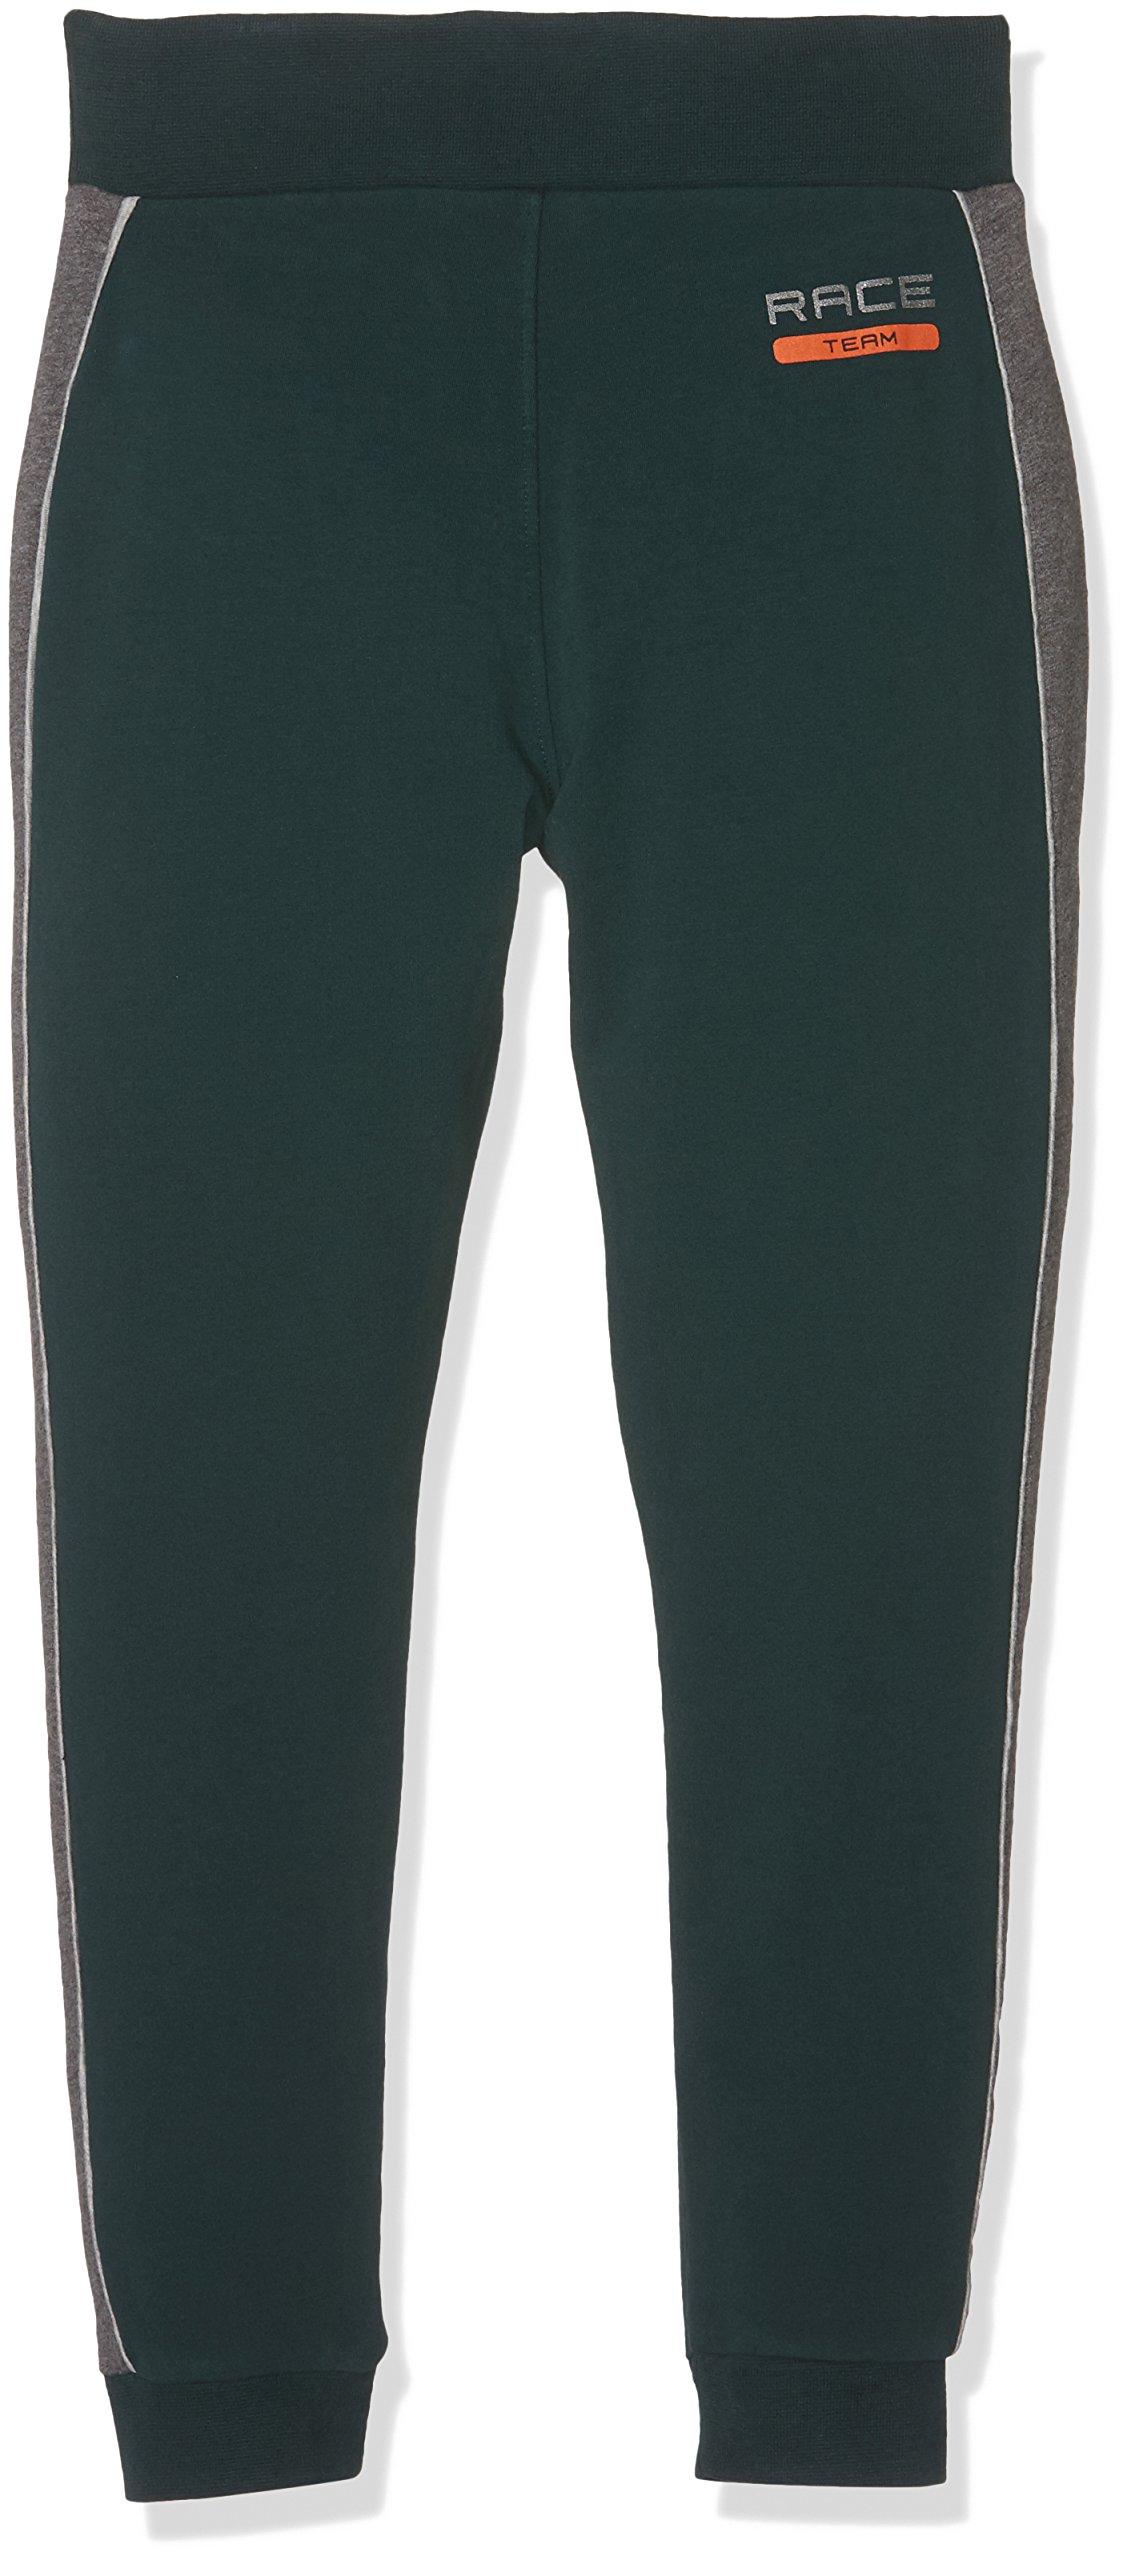 Hackett London Amr Tpant Pantalones para Niños